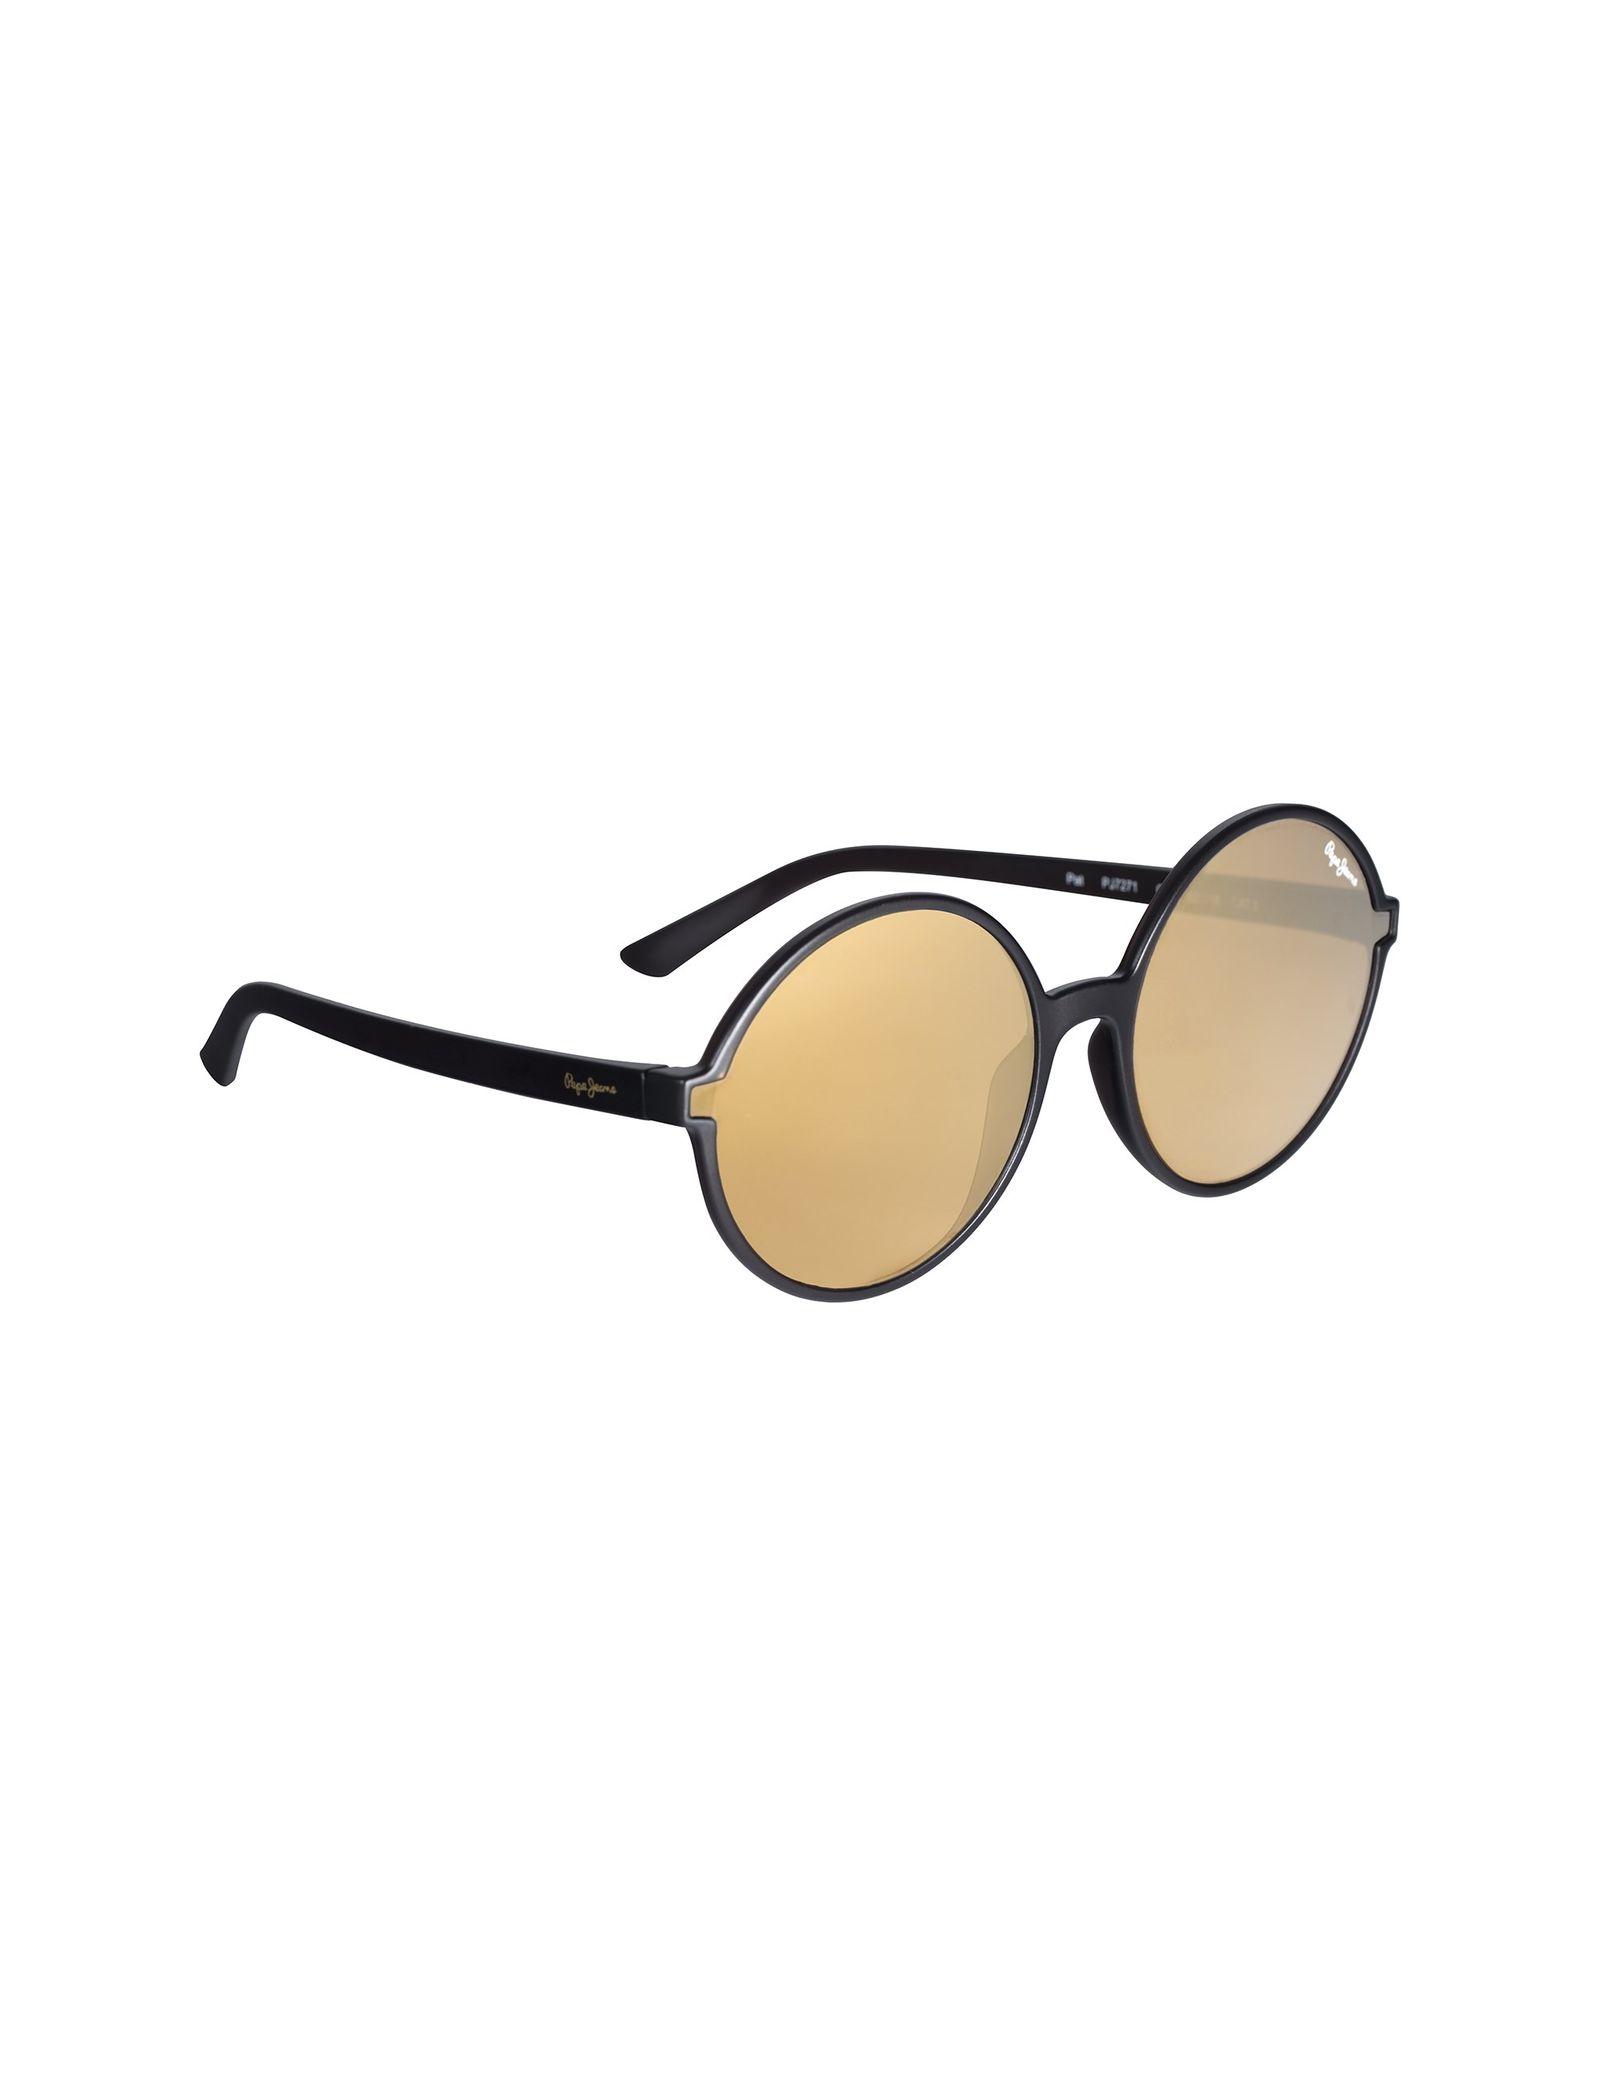 عینک آفتابی گرد زنانه - پپه جینز - زغالي - 2